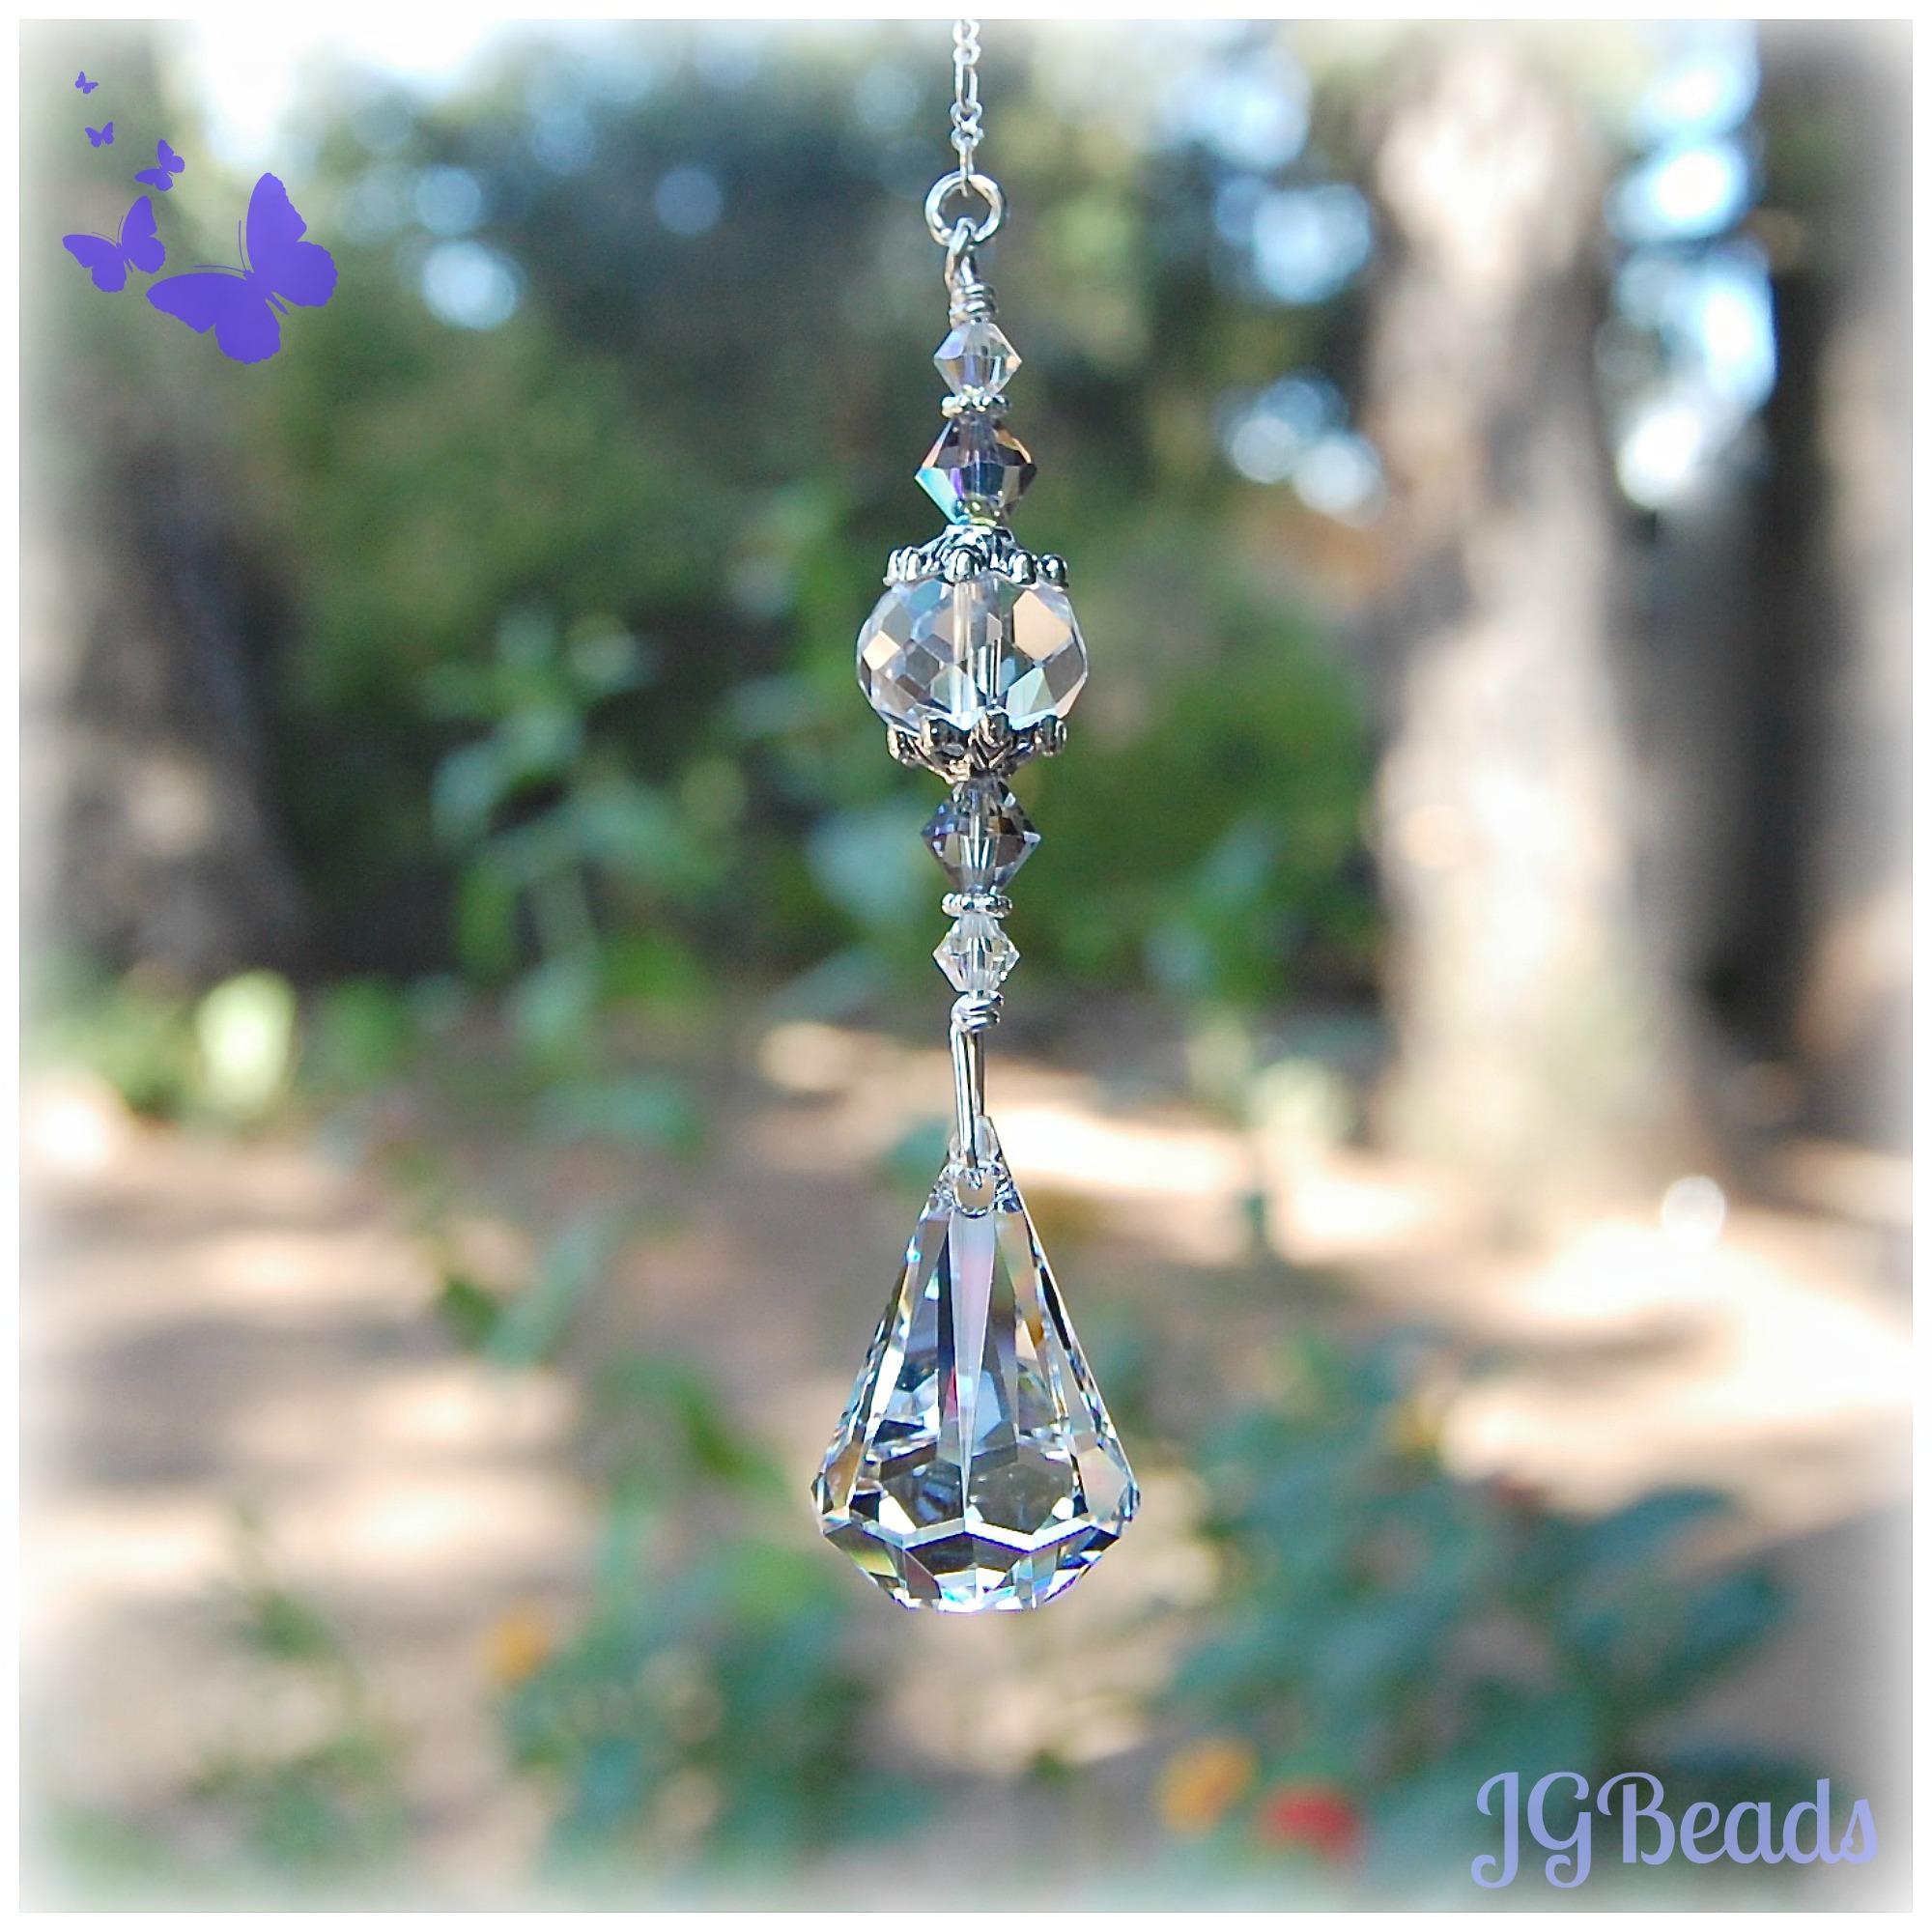 Teardrop Swarovski Crystal Jg Beads